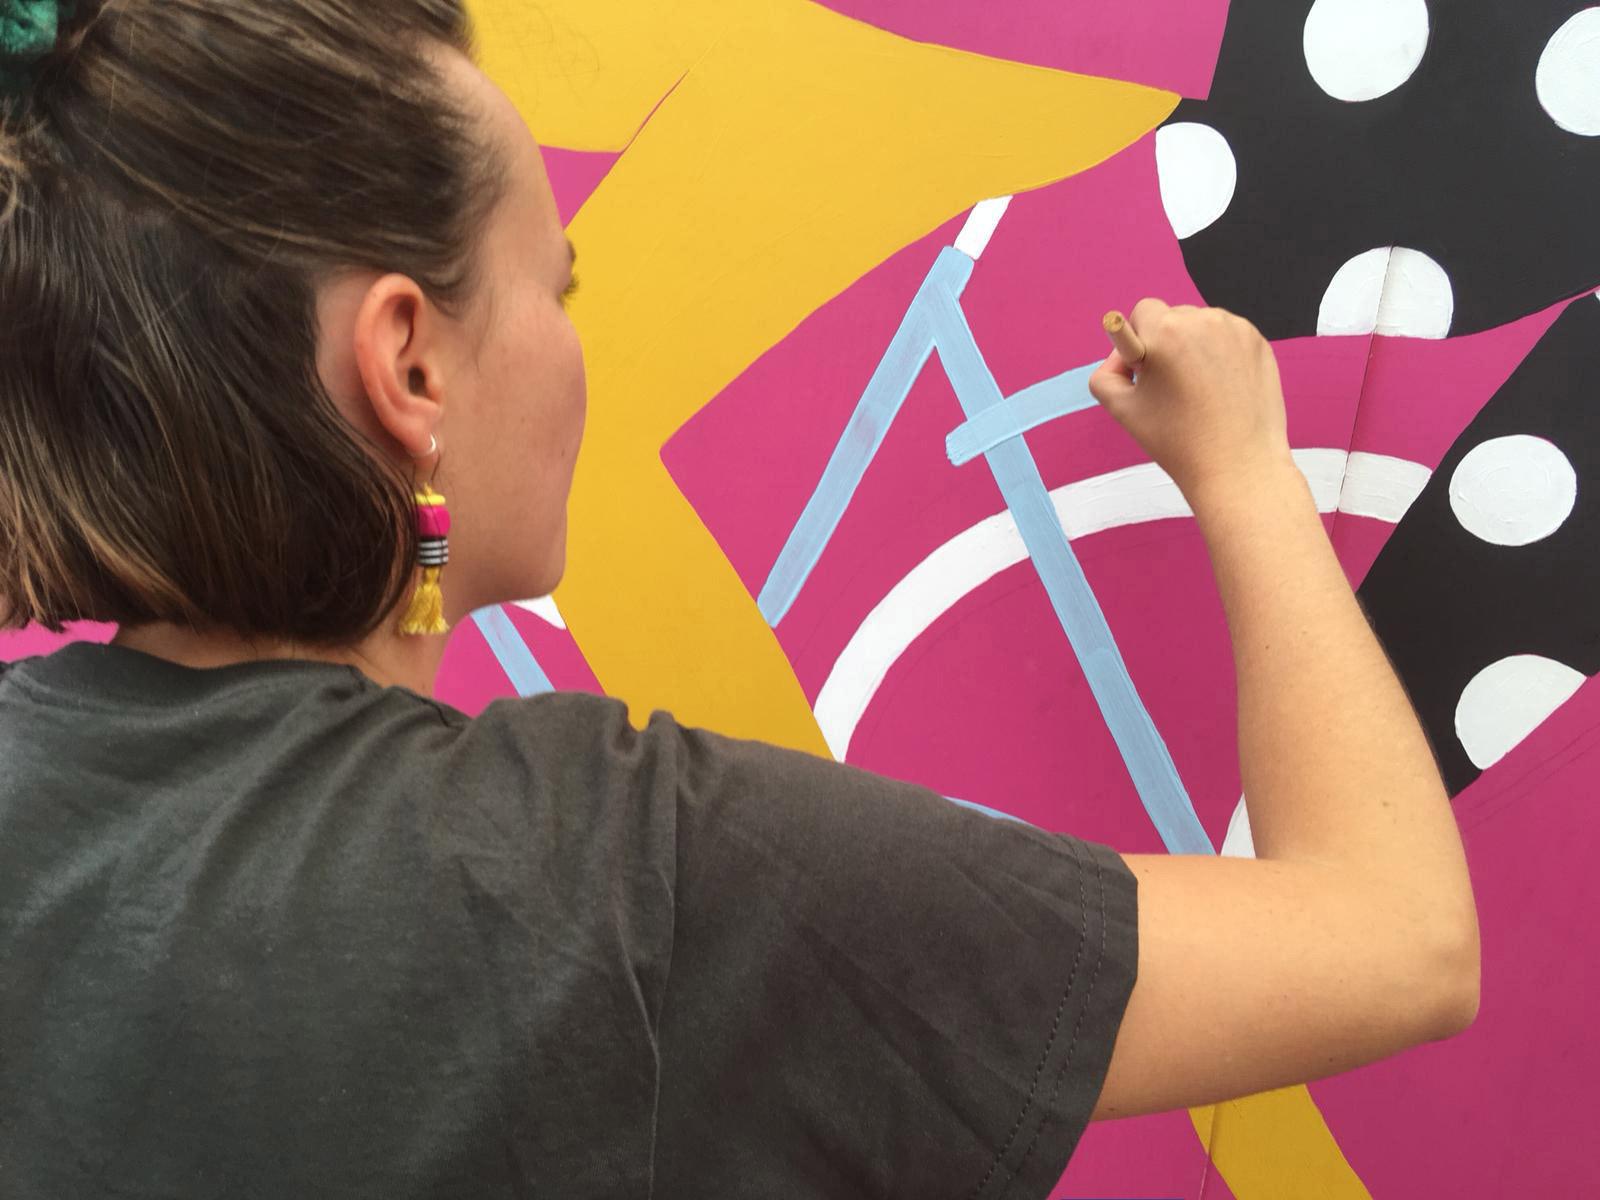 PerrineHonoré可爱又色彩丰富的街头艺术壁画